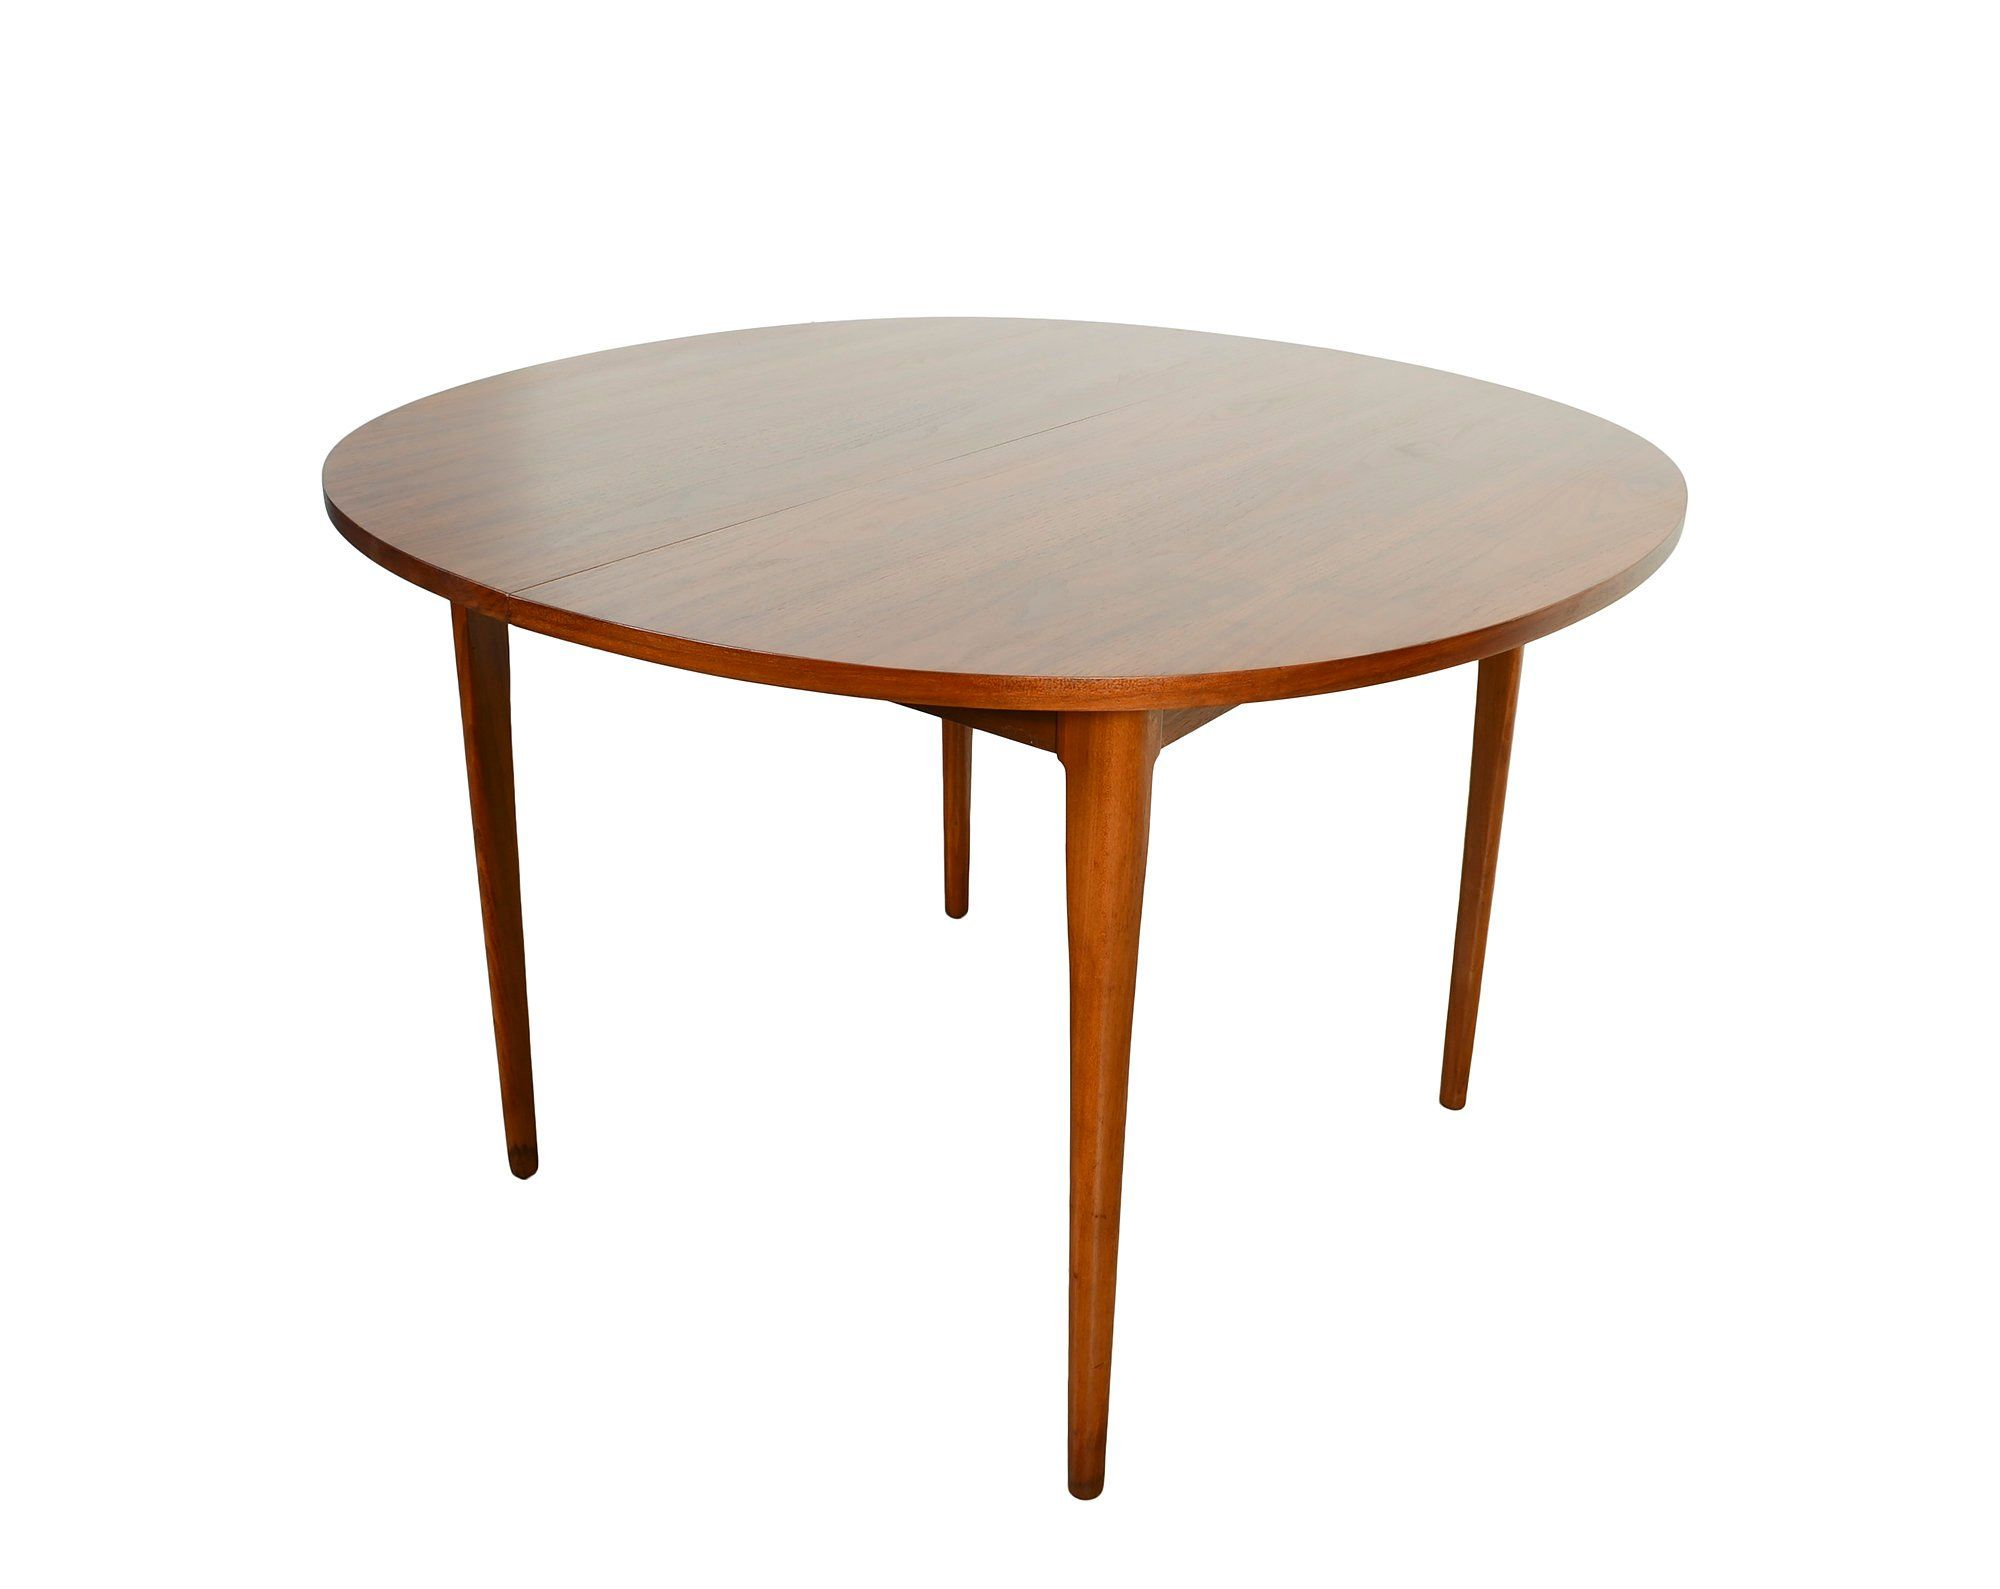 Walnut Dining Table Drexel Declaration Mid Century Modern Round